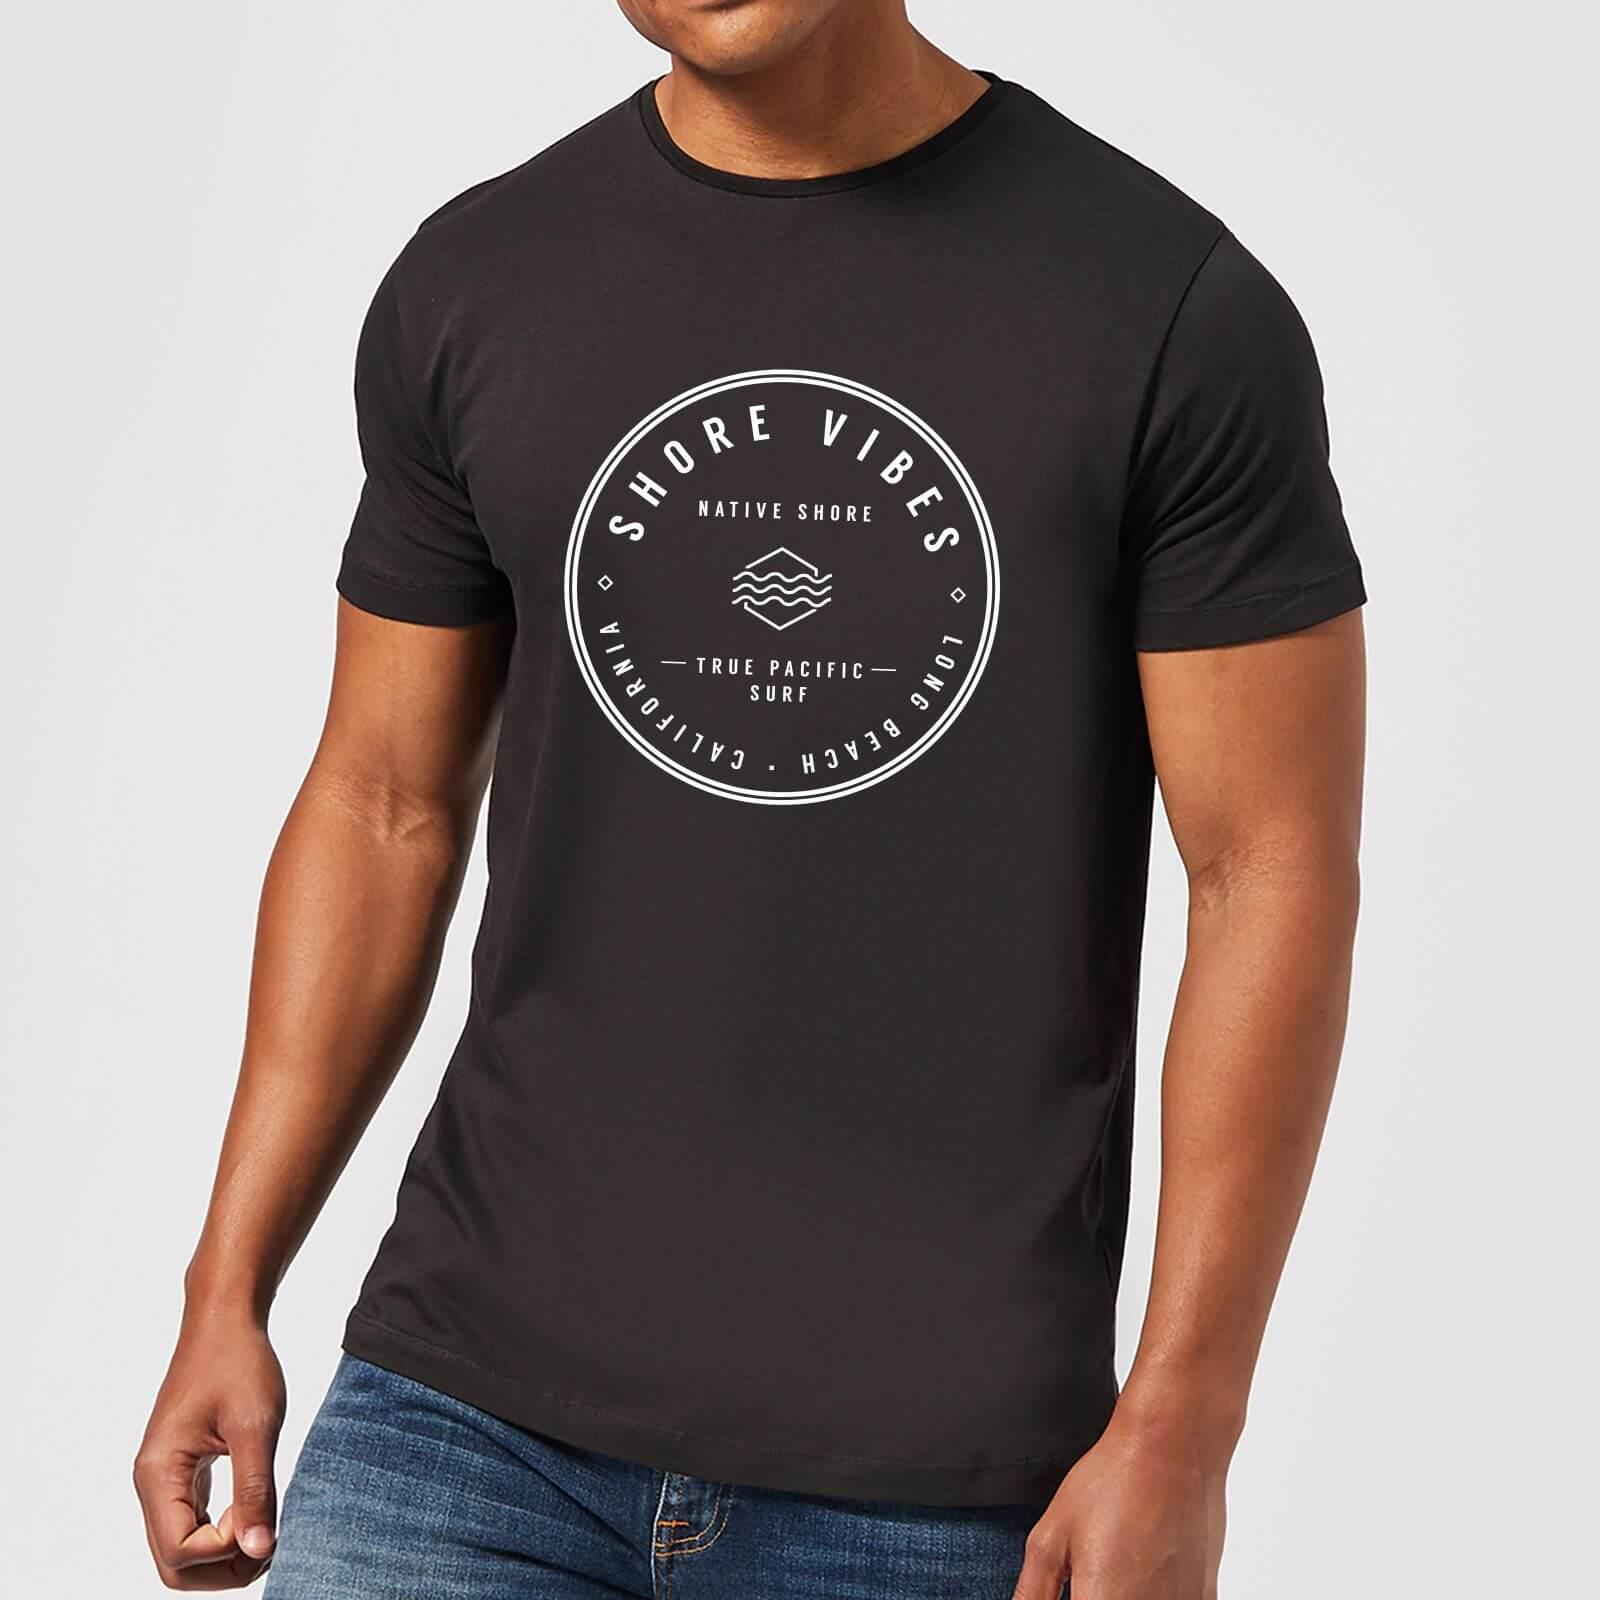 Native Shore Men's Shore Vibes T-Shirt - Black - L - Schwarz